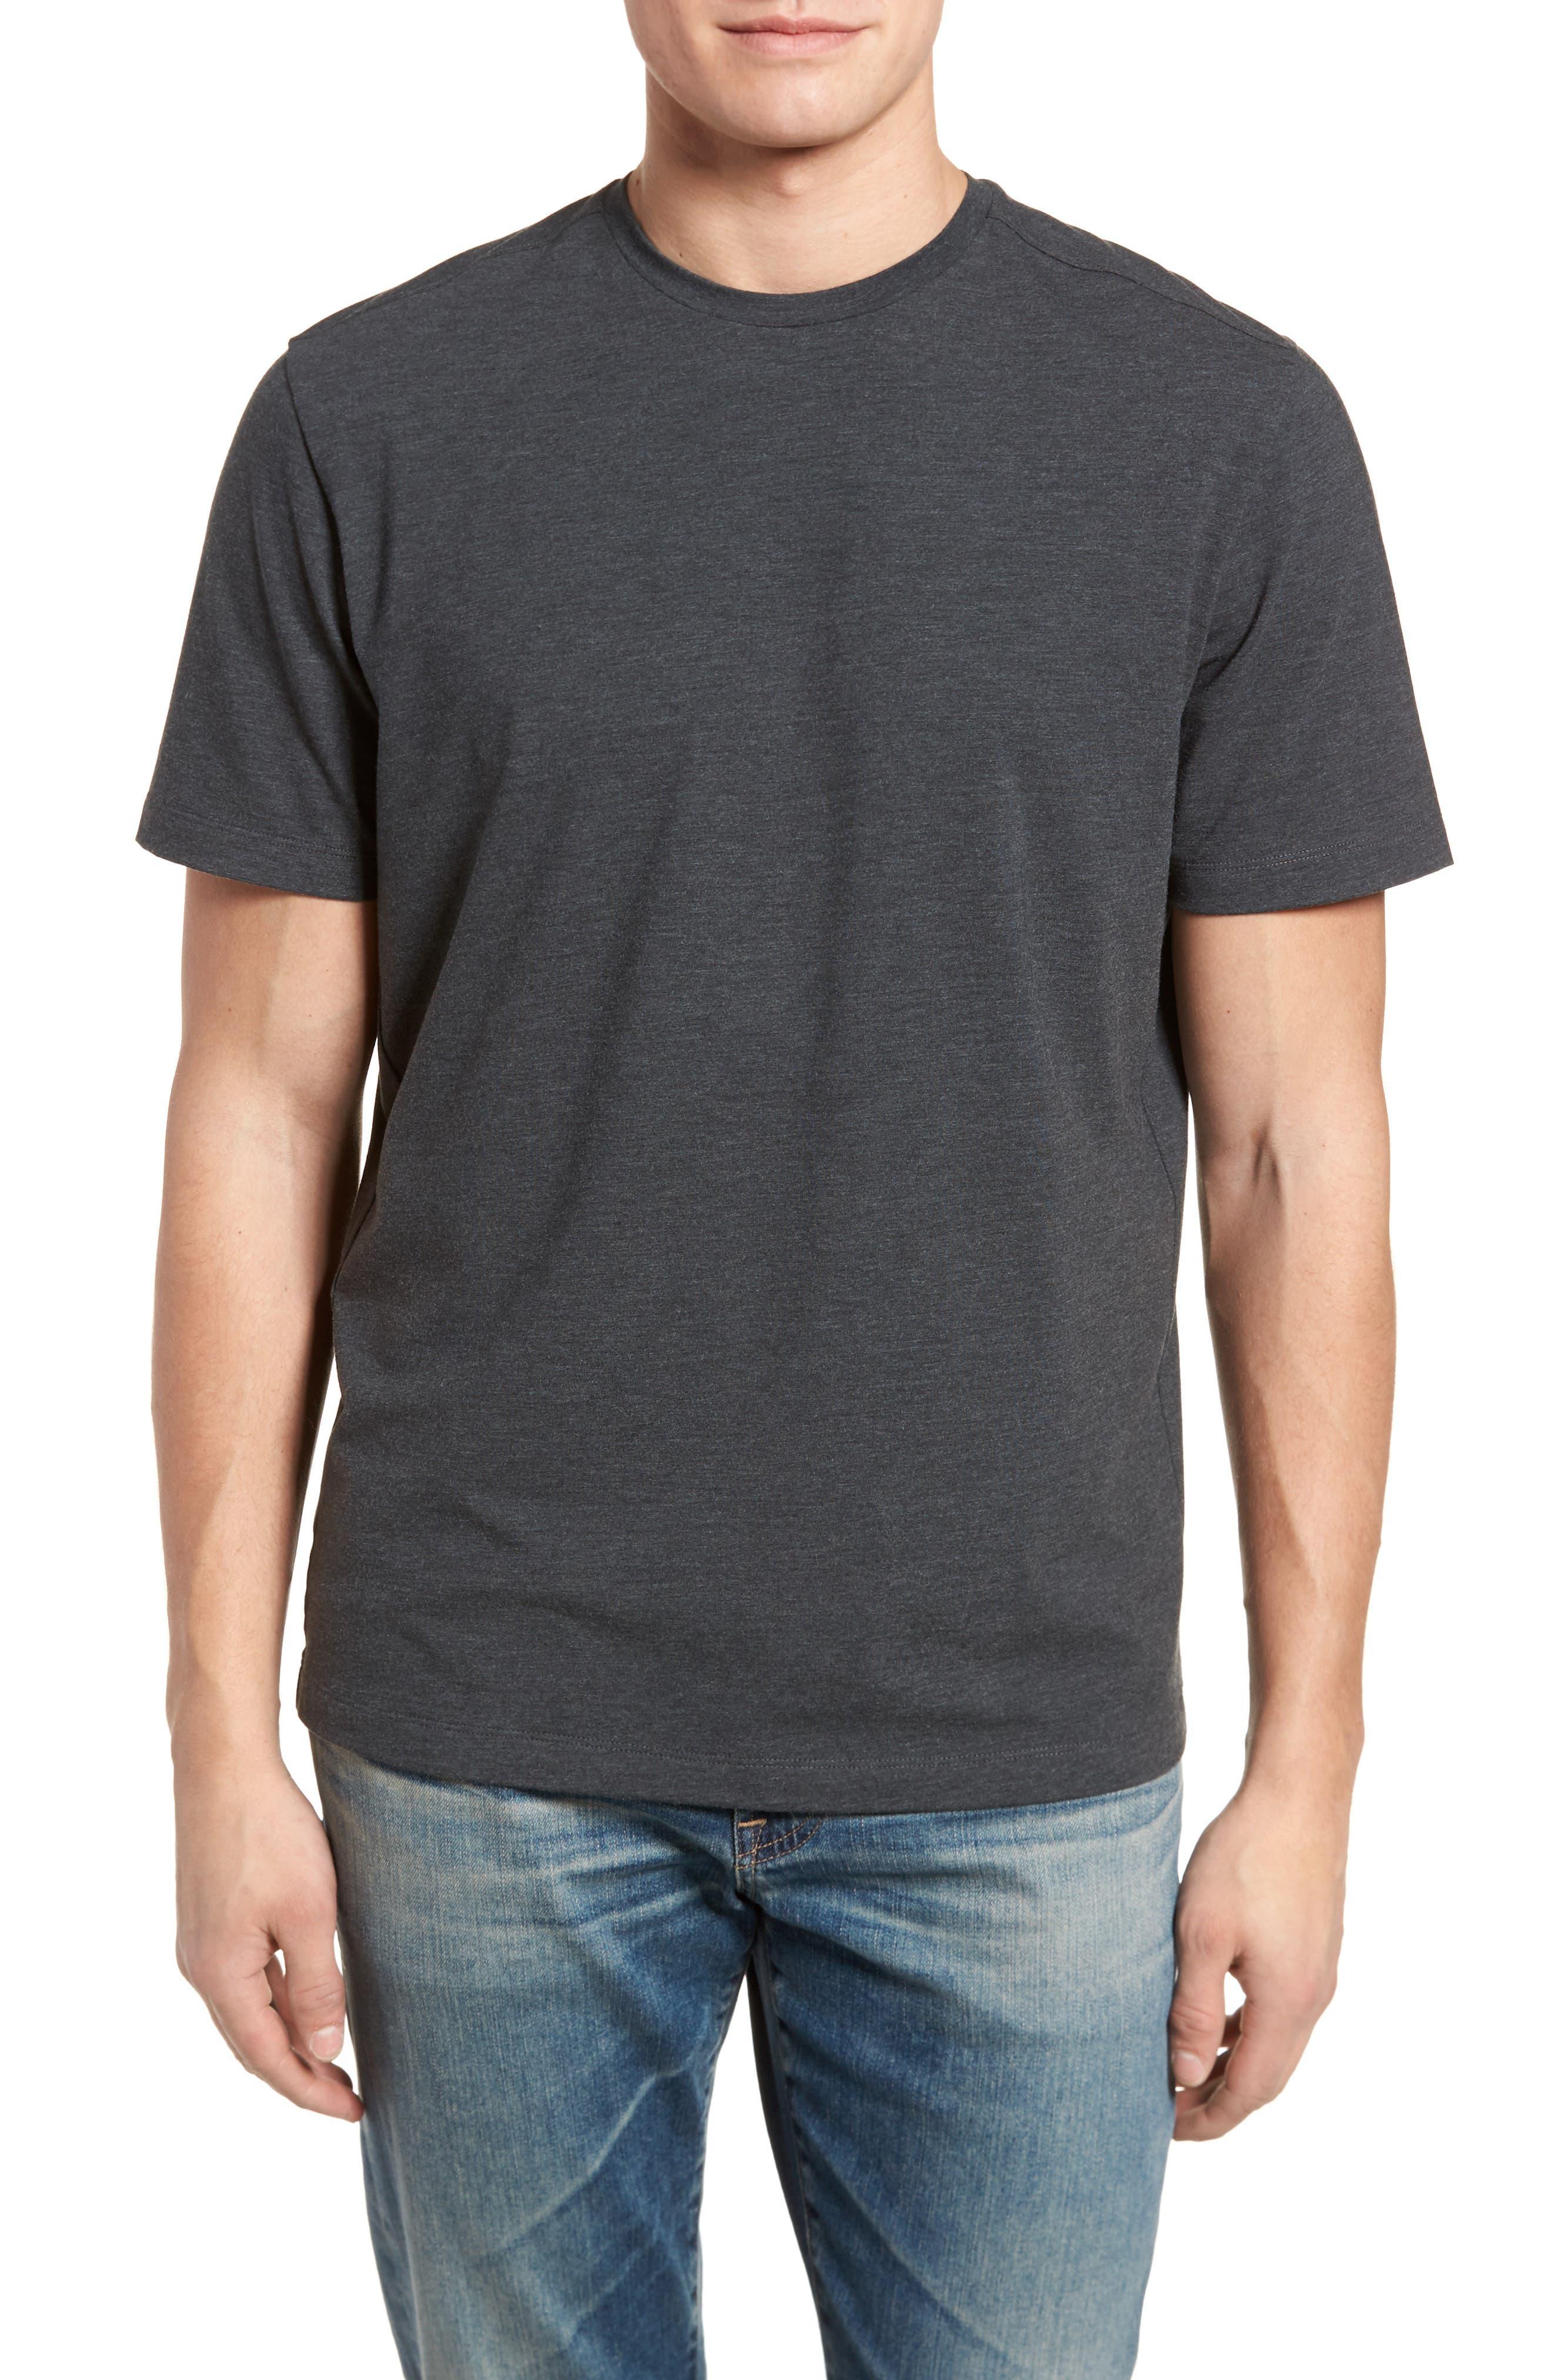 Main Image - Tommy Bahama Tropicool T-Shirt